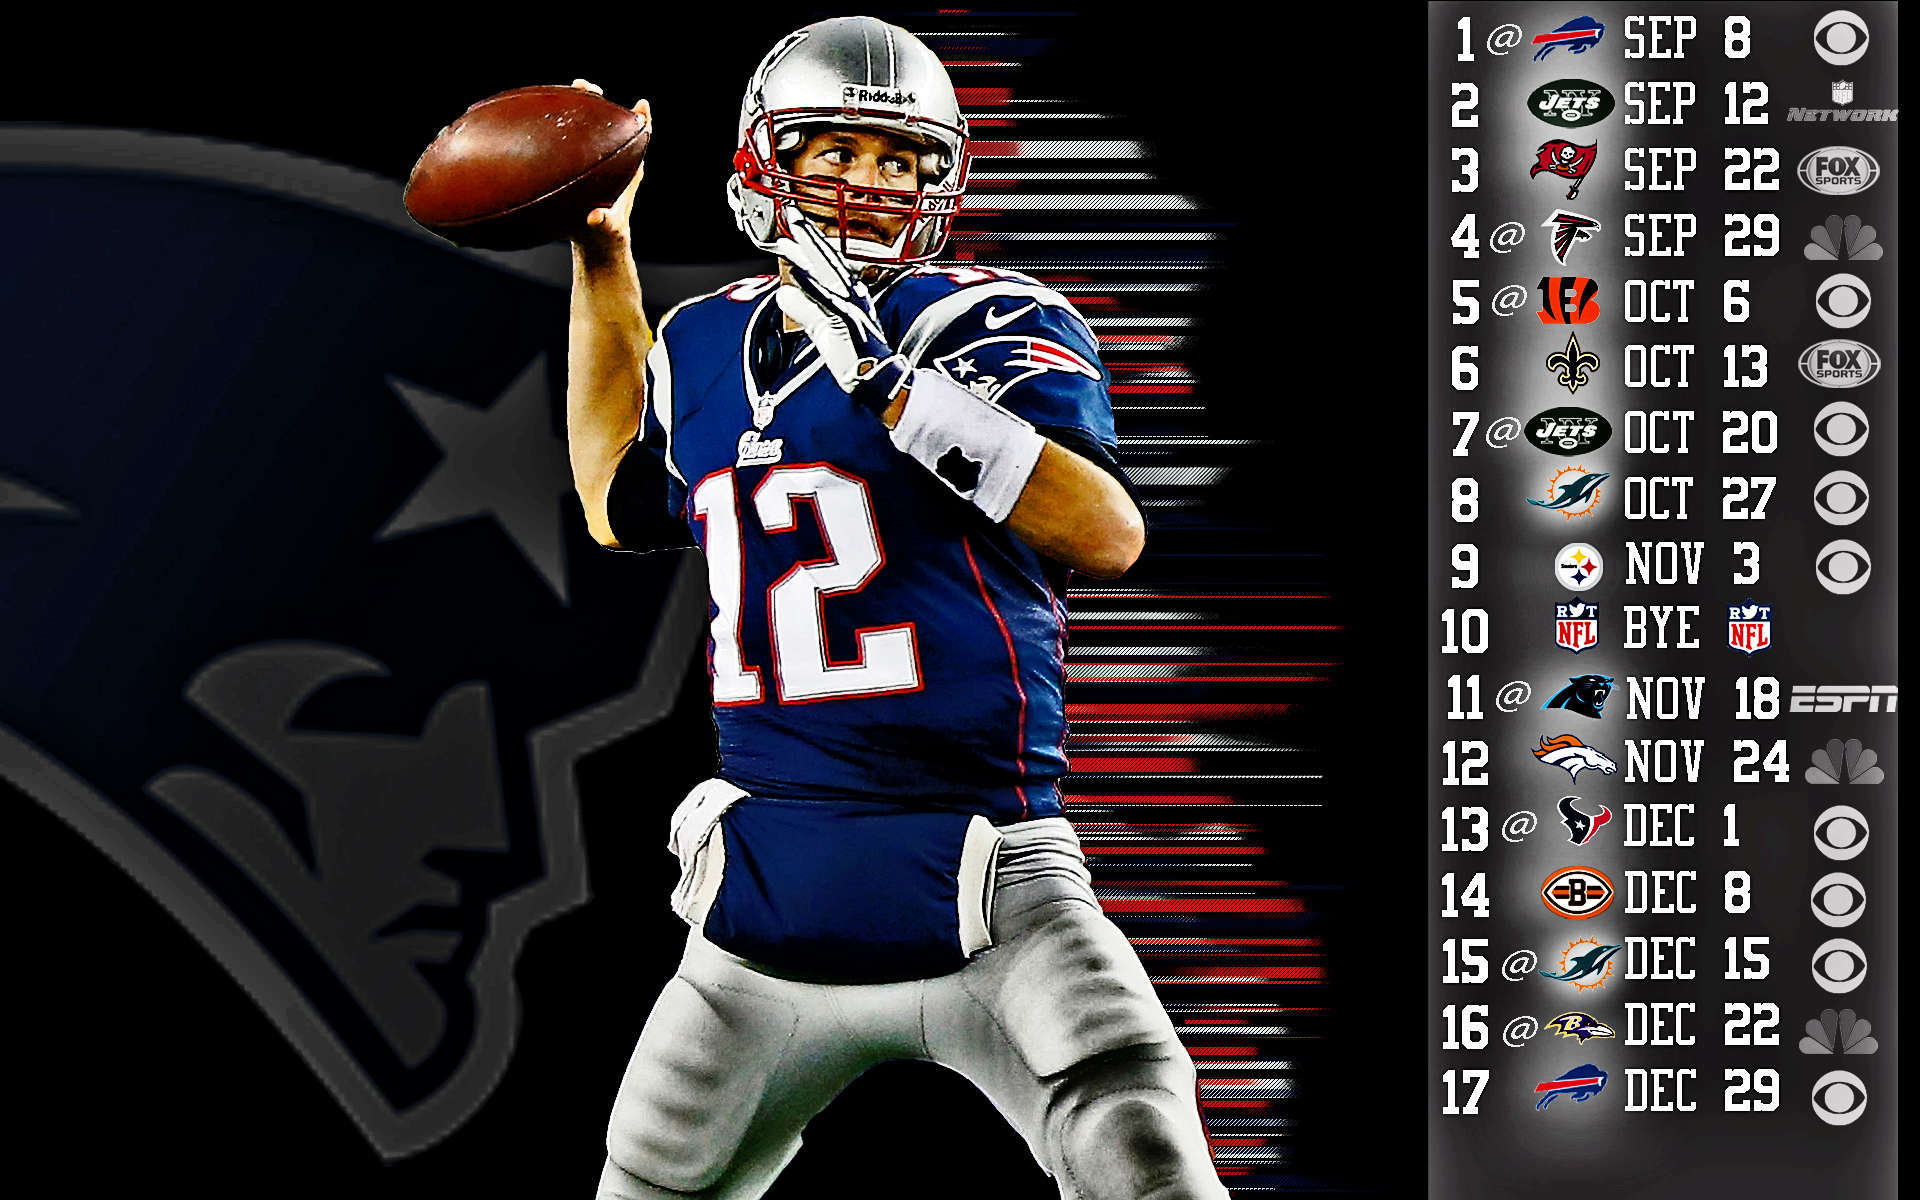 New England Patriots 2015 Superbowl Wallpapers Wallpaper Sport 95642 1920x1200